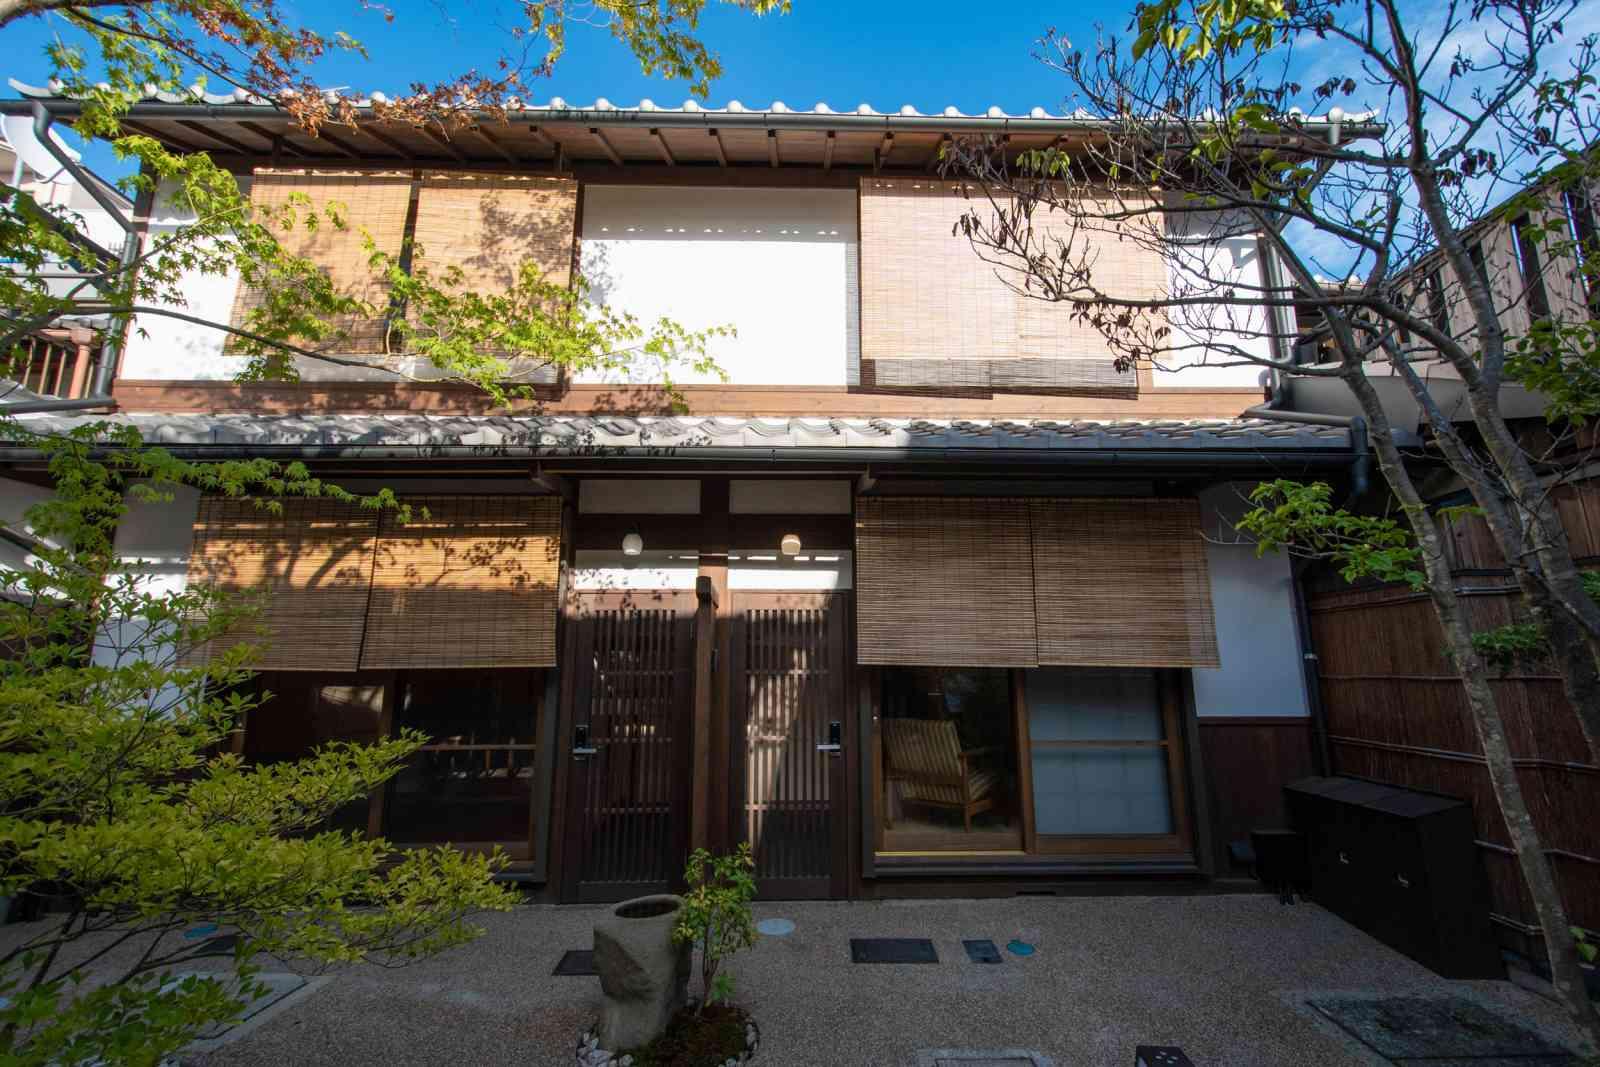 Renovated Kyo-Machiya Houses for Gueshouse, 3 Properties for Sale in Higashiyama Ward, Kyoto